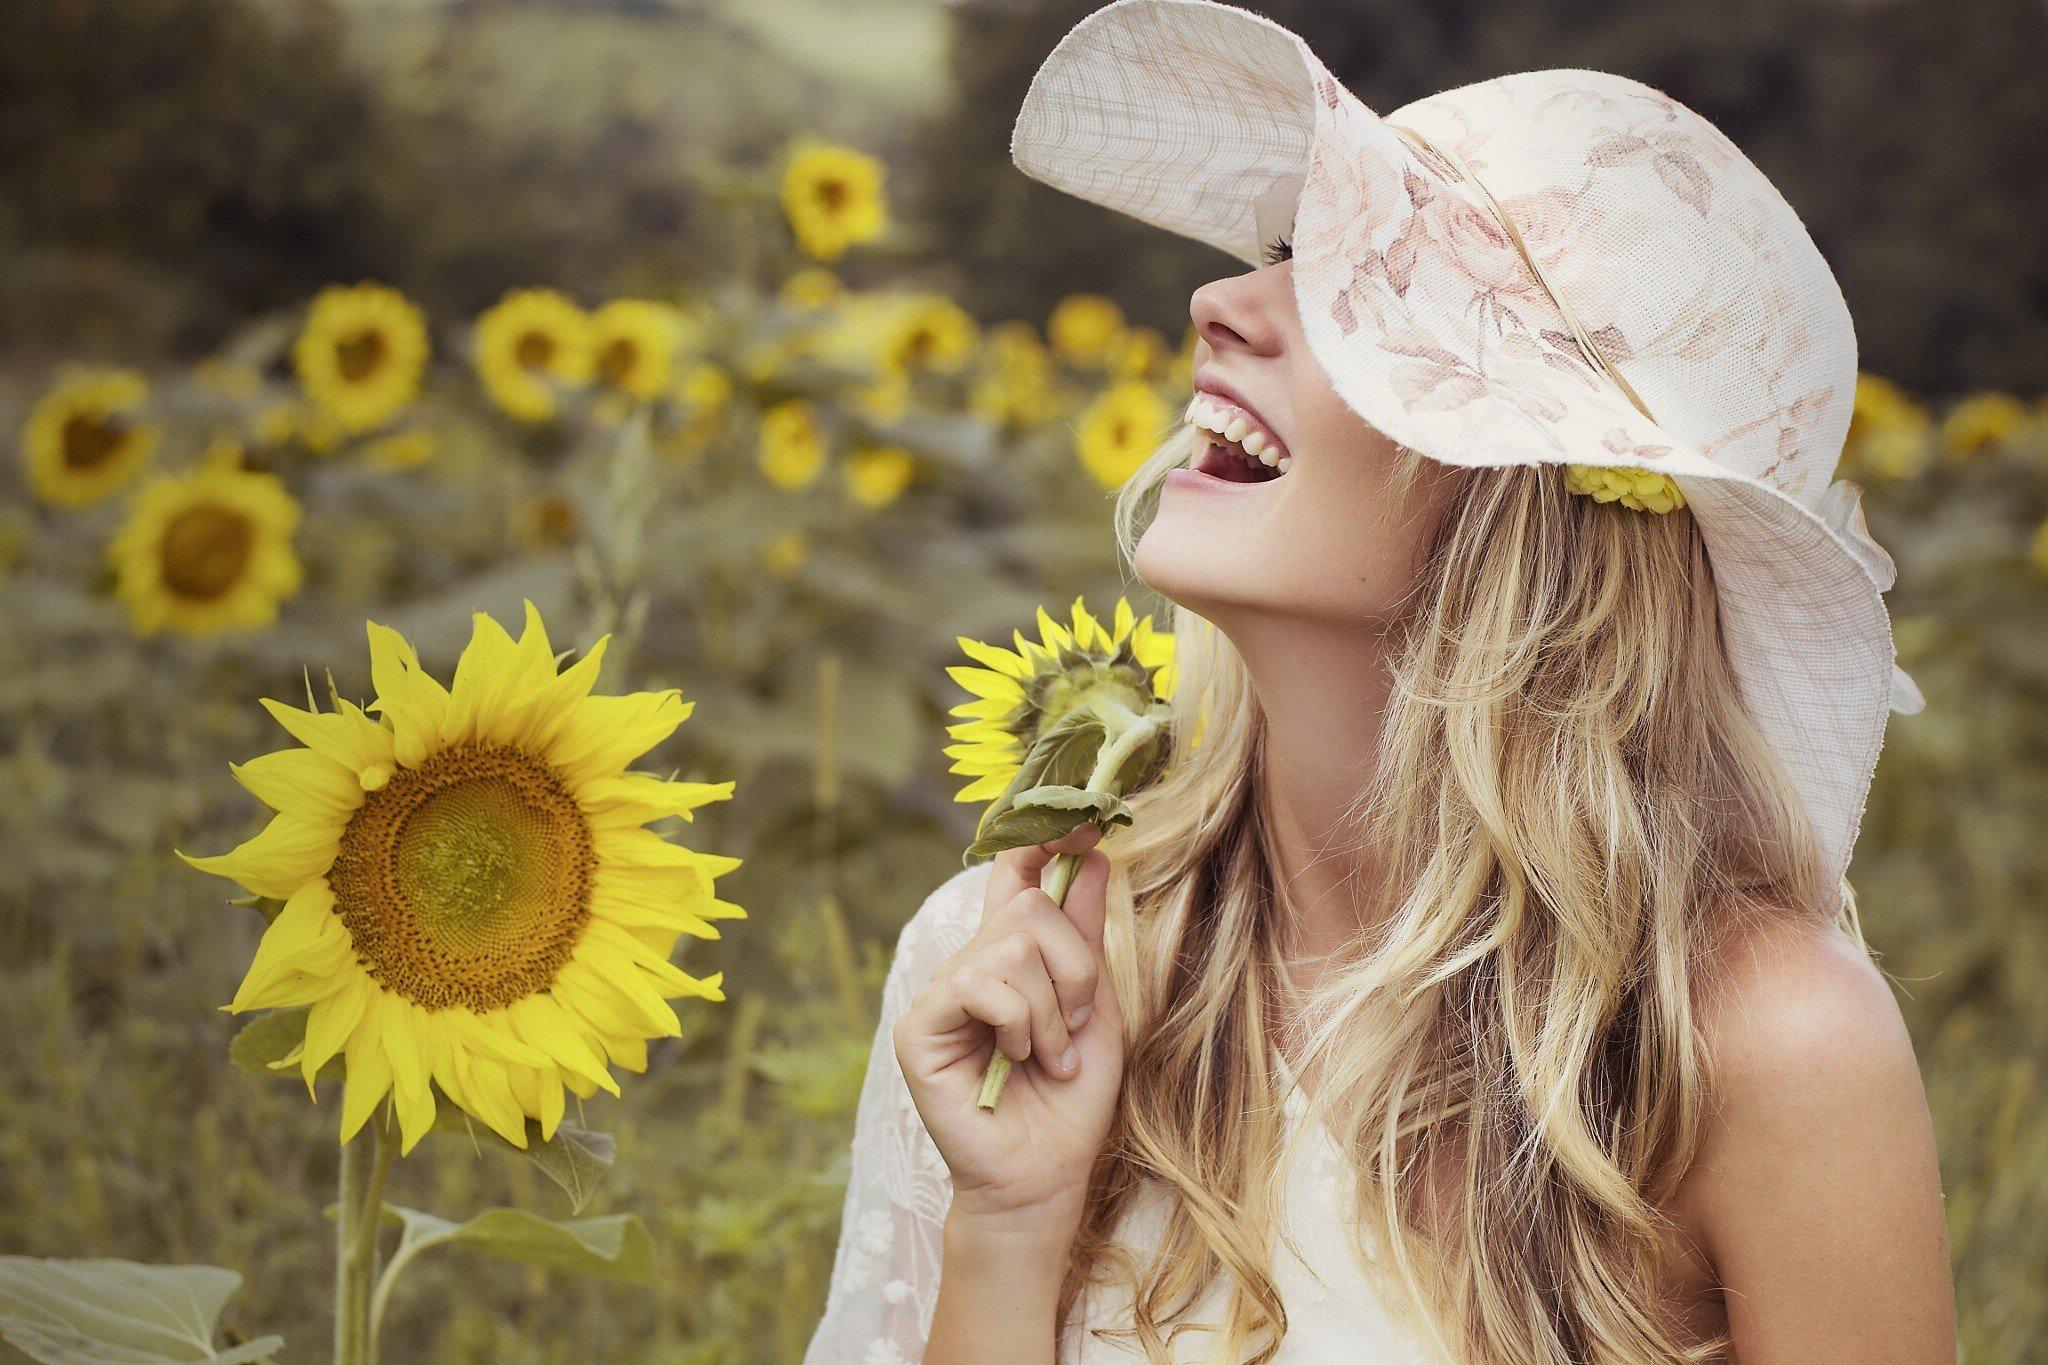 women, Model, Blonde, Sunflowers, Smiling, Long hair, Wavy hair, Women outdoors, Flowers, Yellow flowers Wallpaper